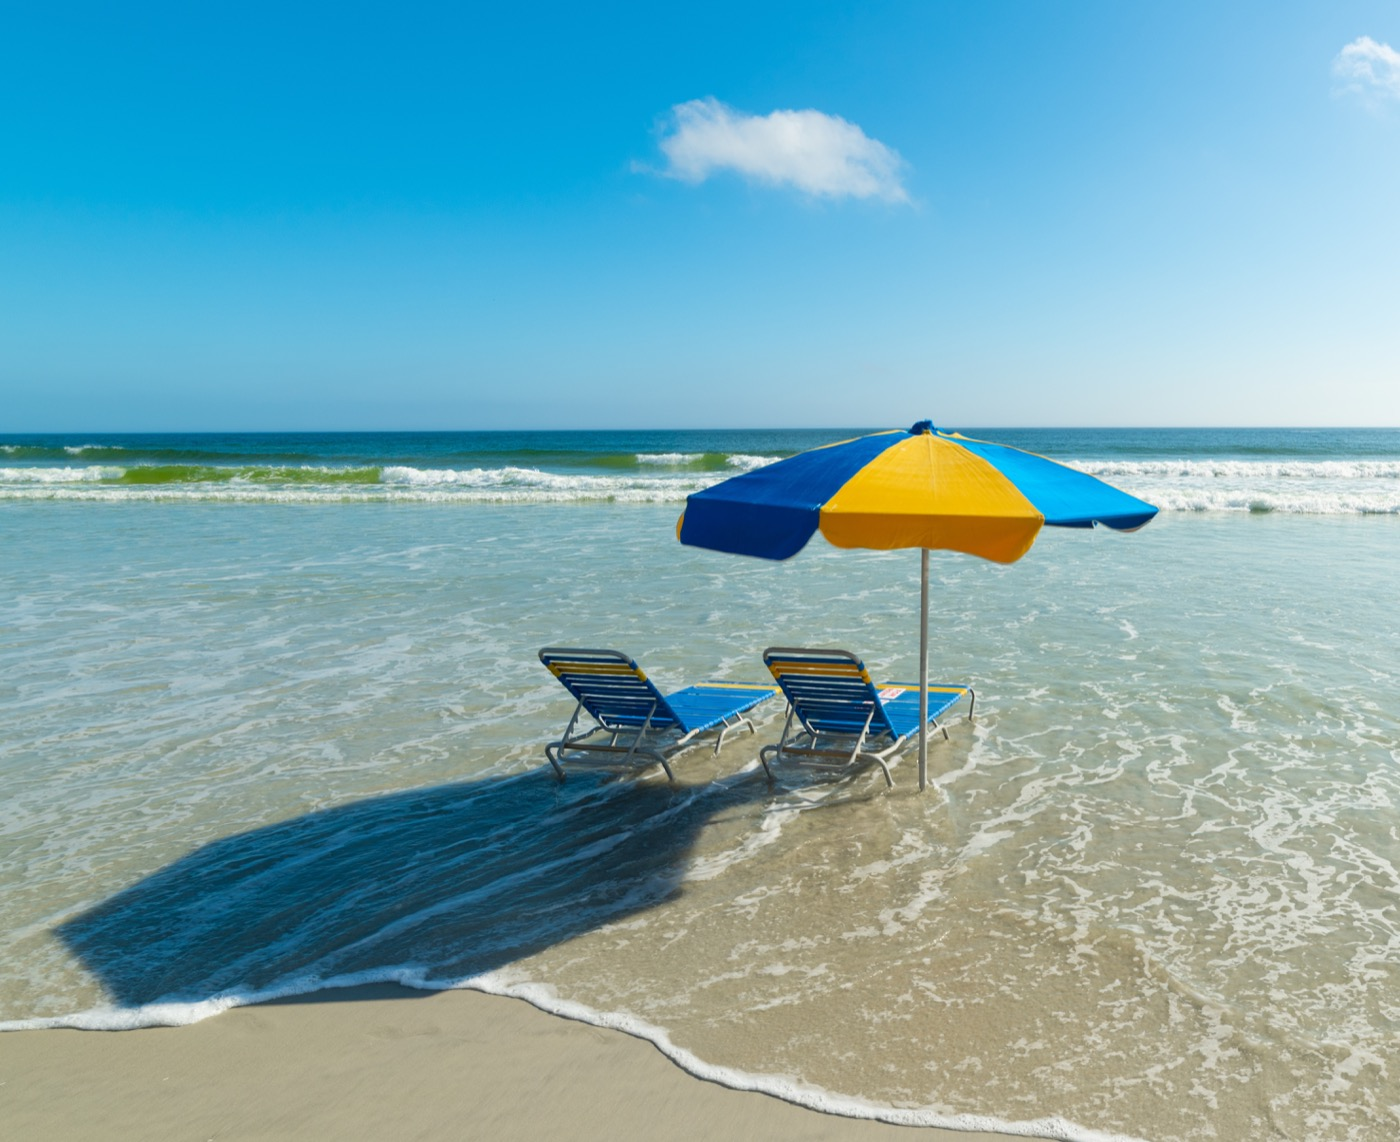 Beach chairs and beach umbrella in Daytona Beach